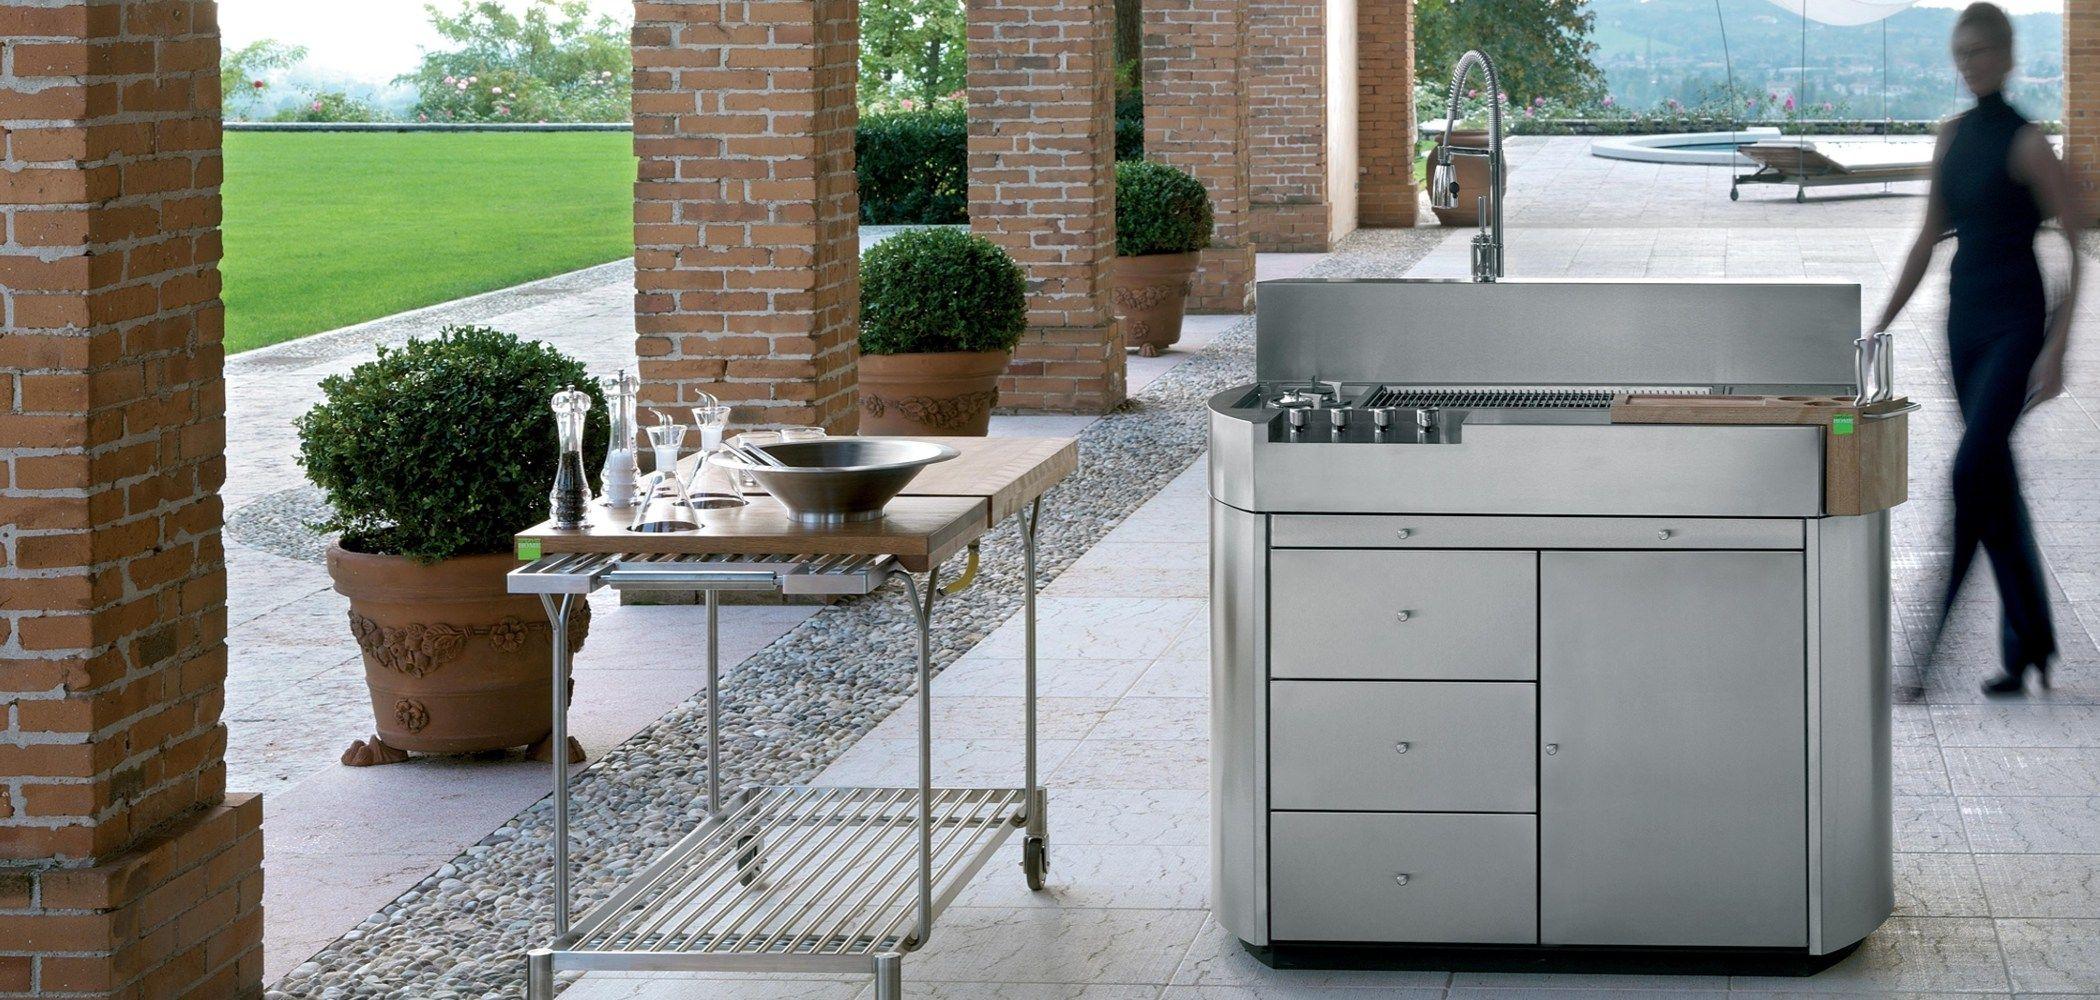 Cucina da esterno cheope by metalco design alfredo tasca - Cucina da esterno ...